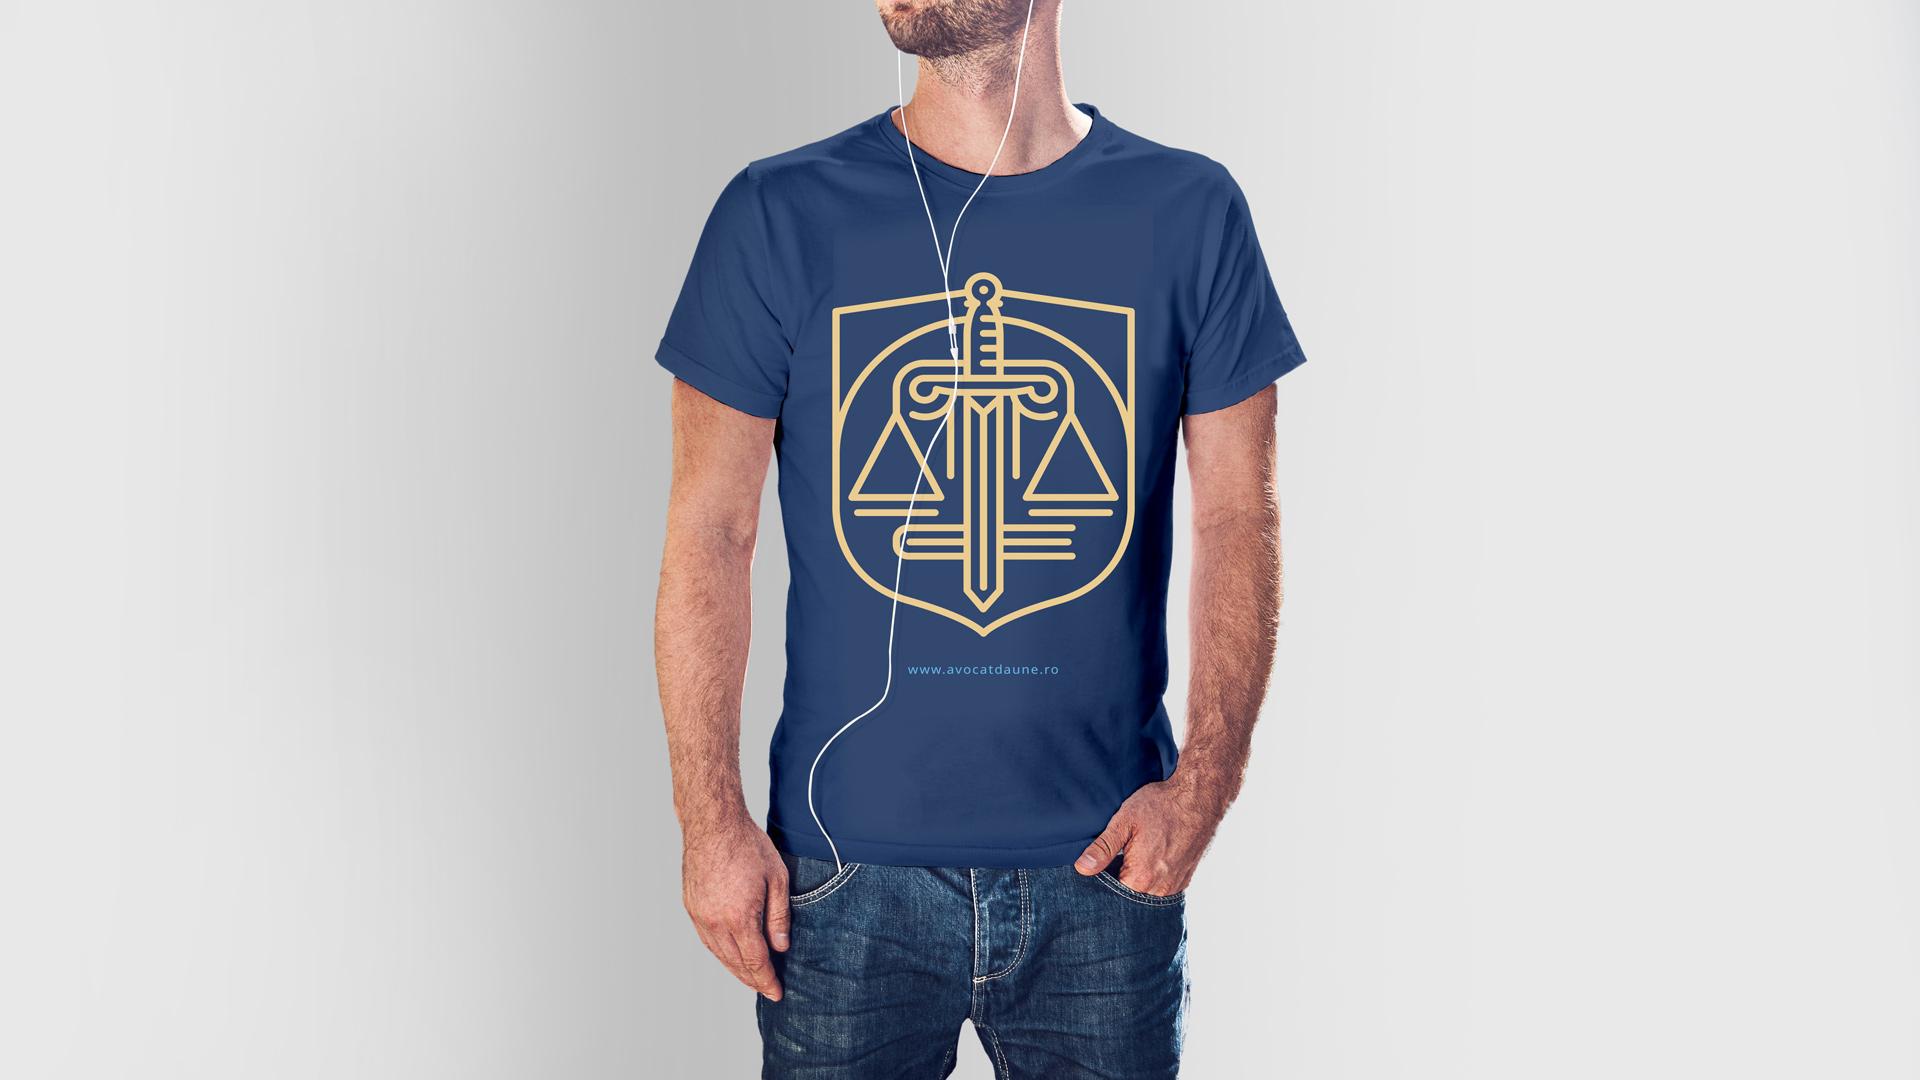 Avocat Daune Tshirt Design